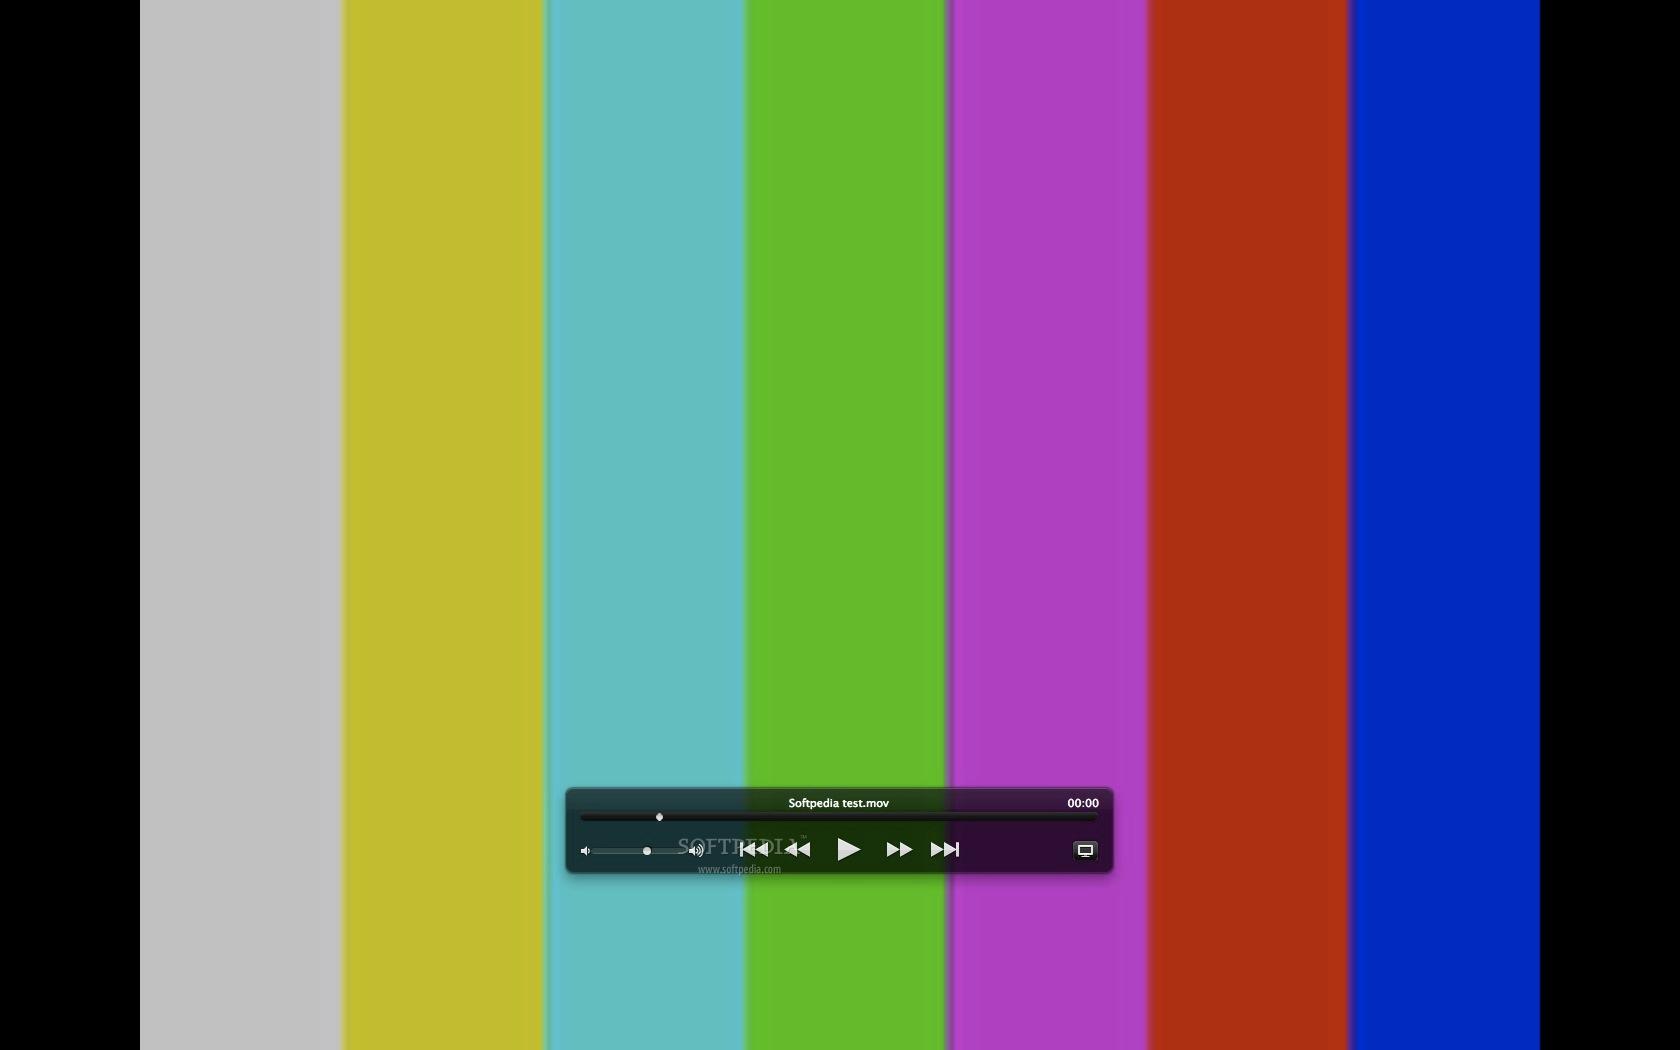 Mac os x download window